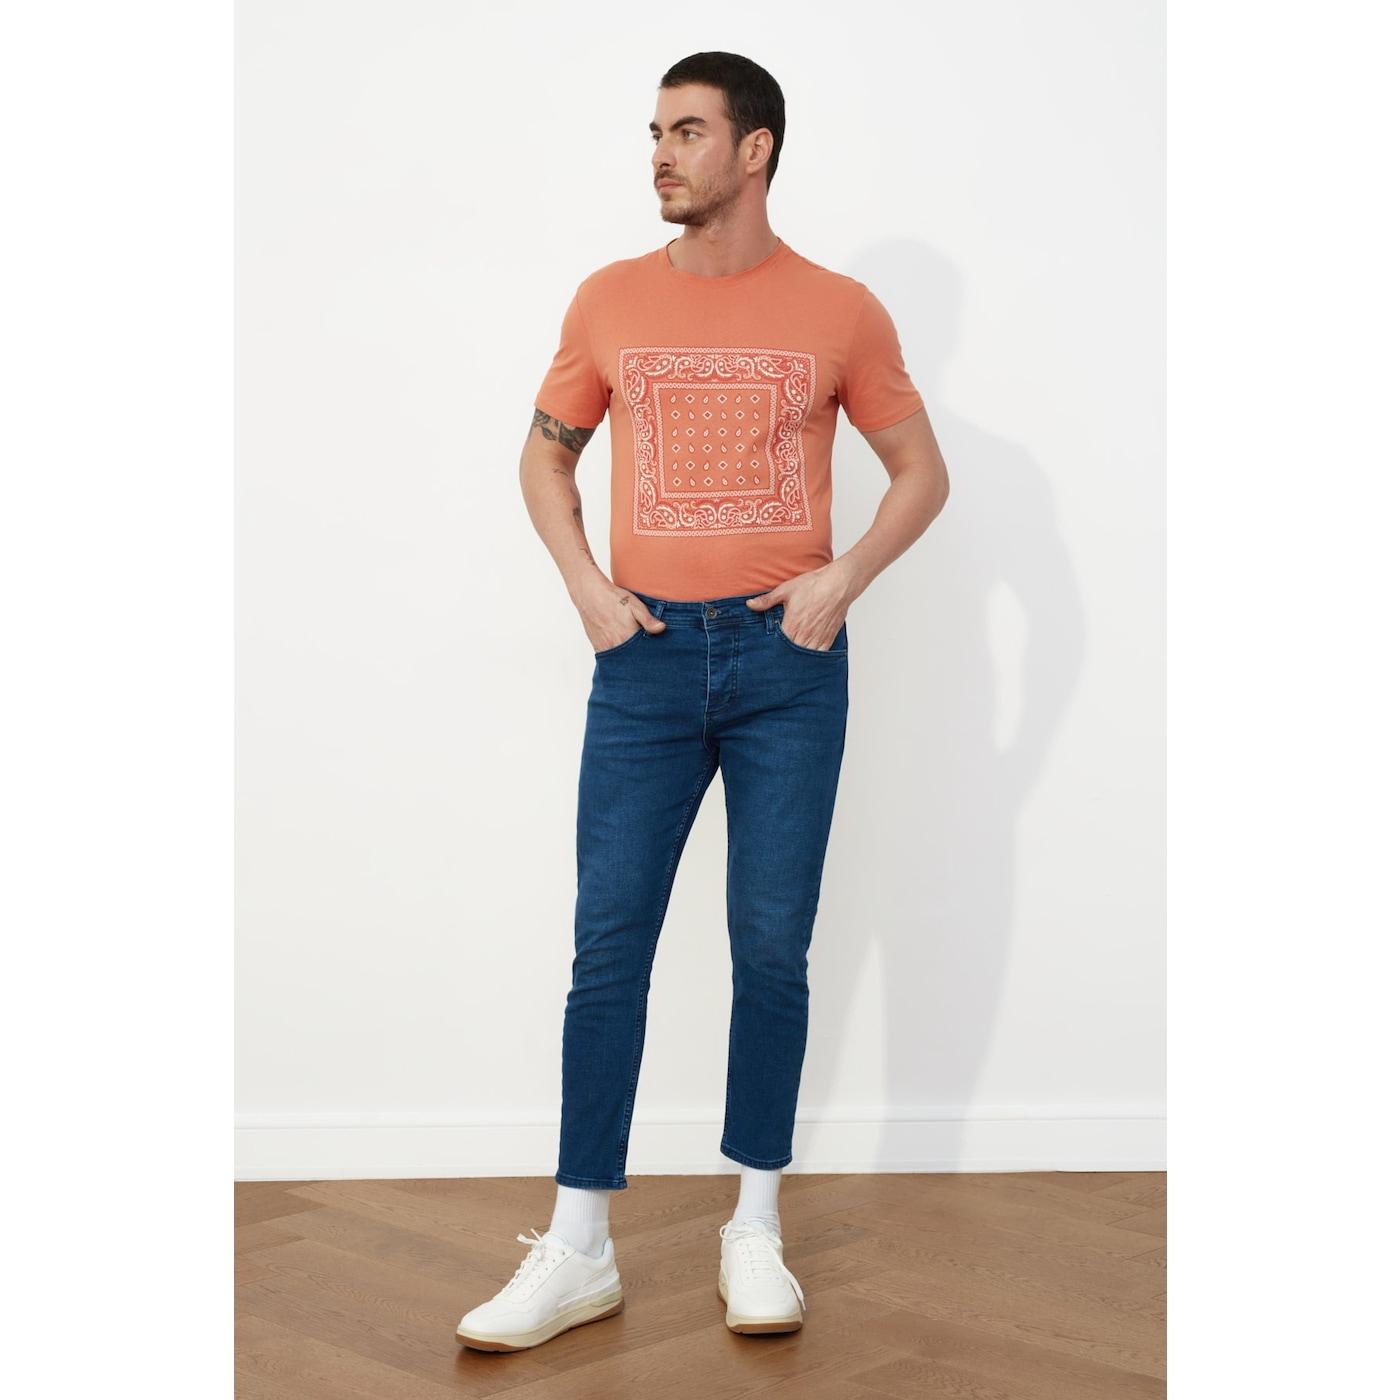 Trendyol Outdoor Navy Blue Male Skinny Crop Jeans AÇIK LACİVERT 33